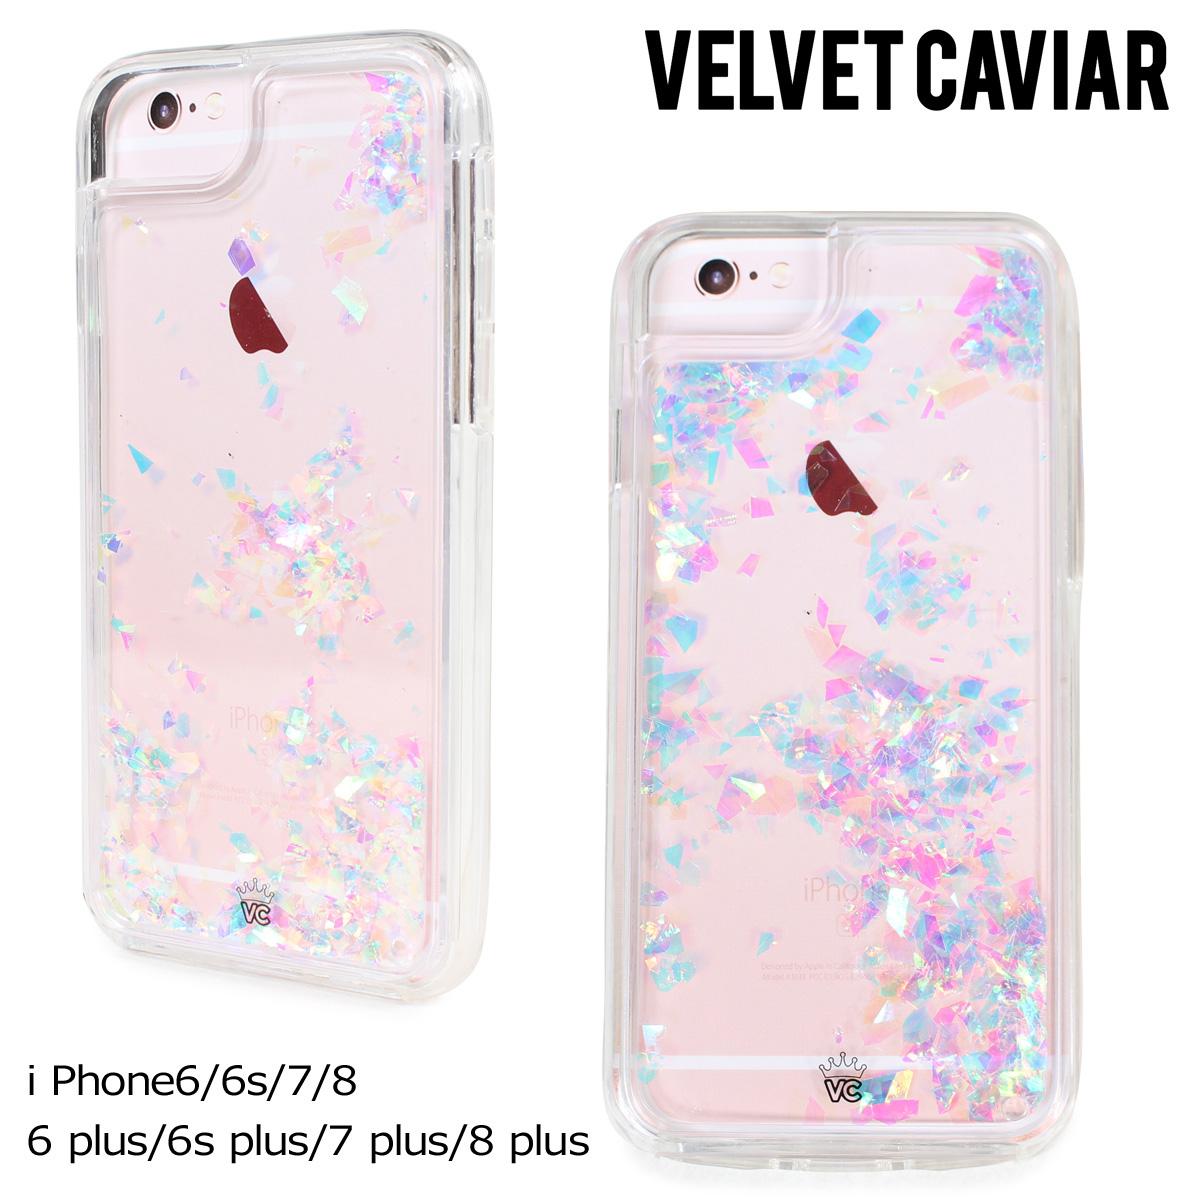 new product e17df 1d629 Velvet Caviar FLAKES DUAL IPHONE CASE velvet caviar iPhone8 iPhone7 8 Plus  7Plus 6s six cases smartphone iPhone case eyephone iPhone velvet Lady's ...